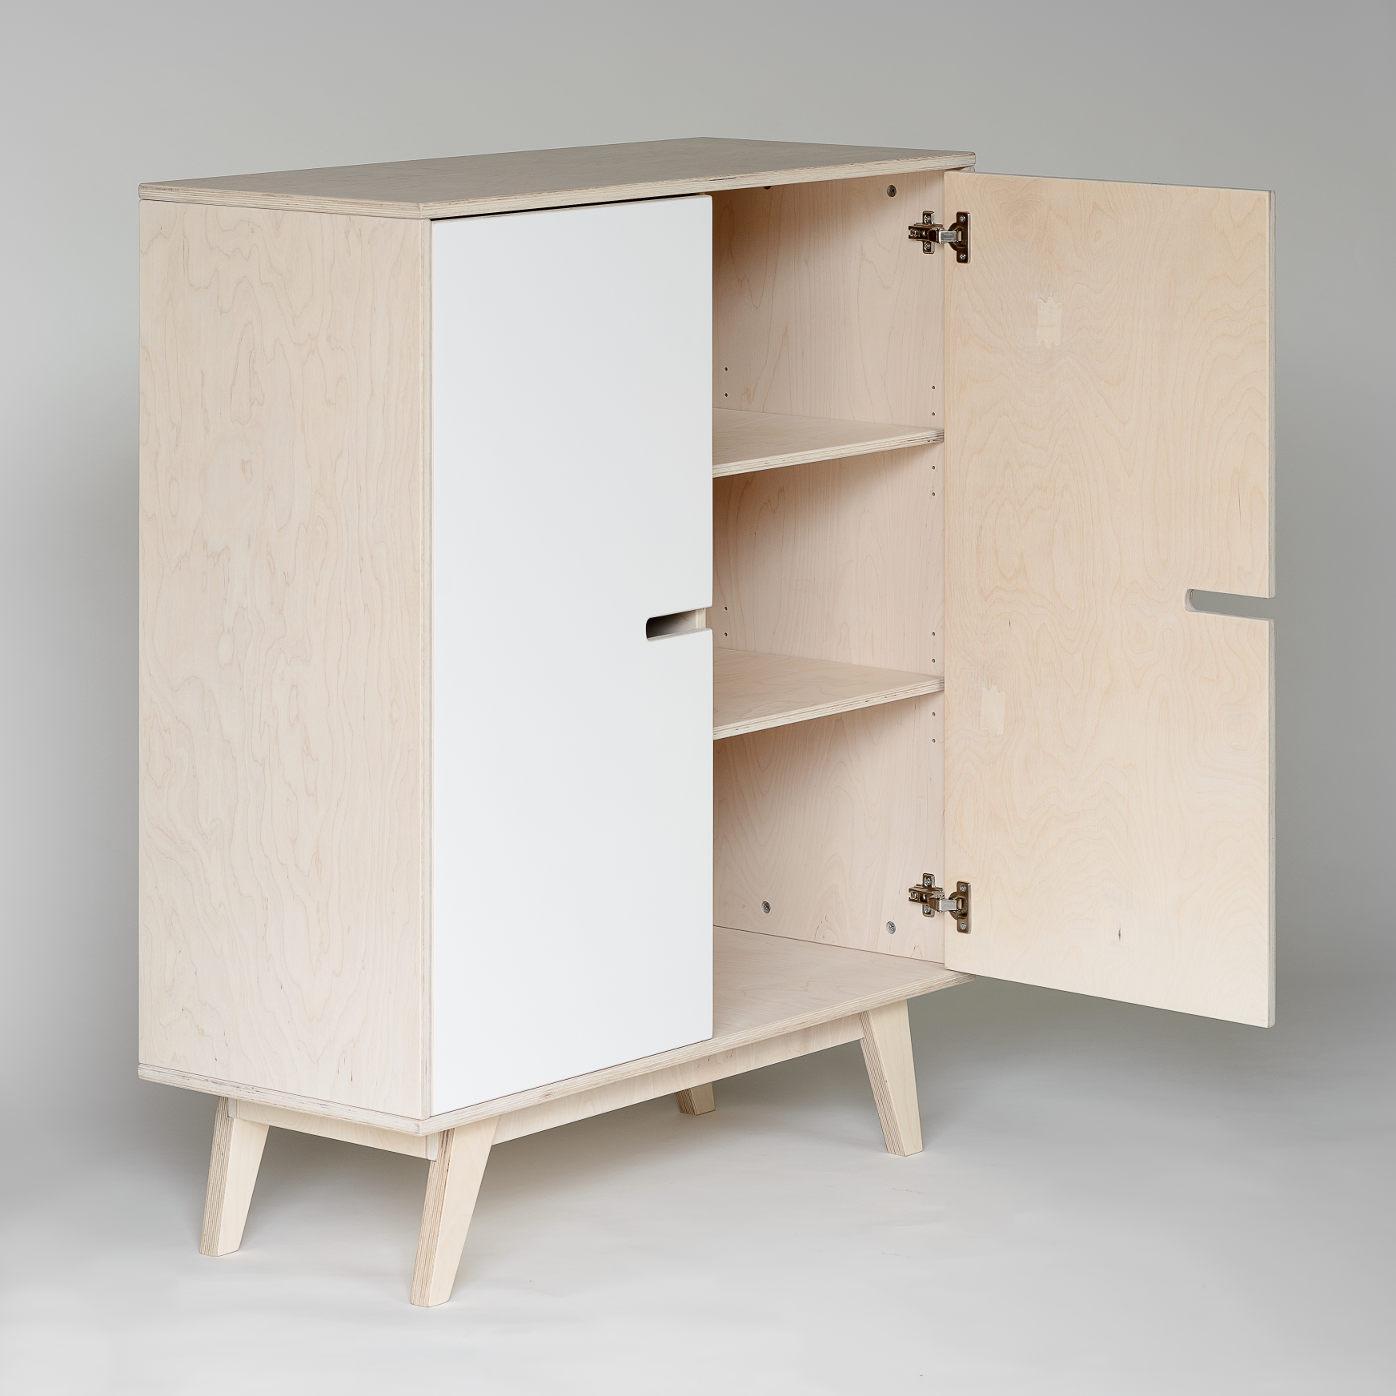 kommode aus holz mit t ren skandinavisch. Black Bedroom Furniture Sets. Home Design Ideas